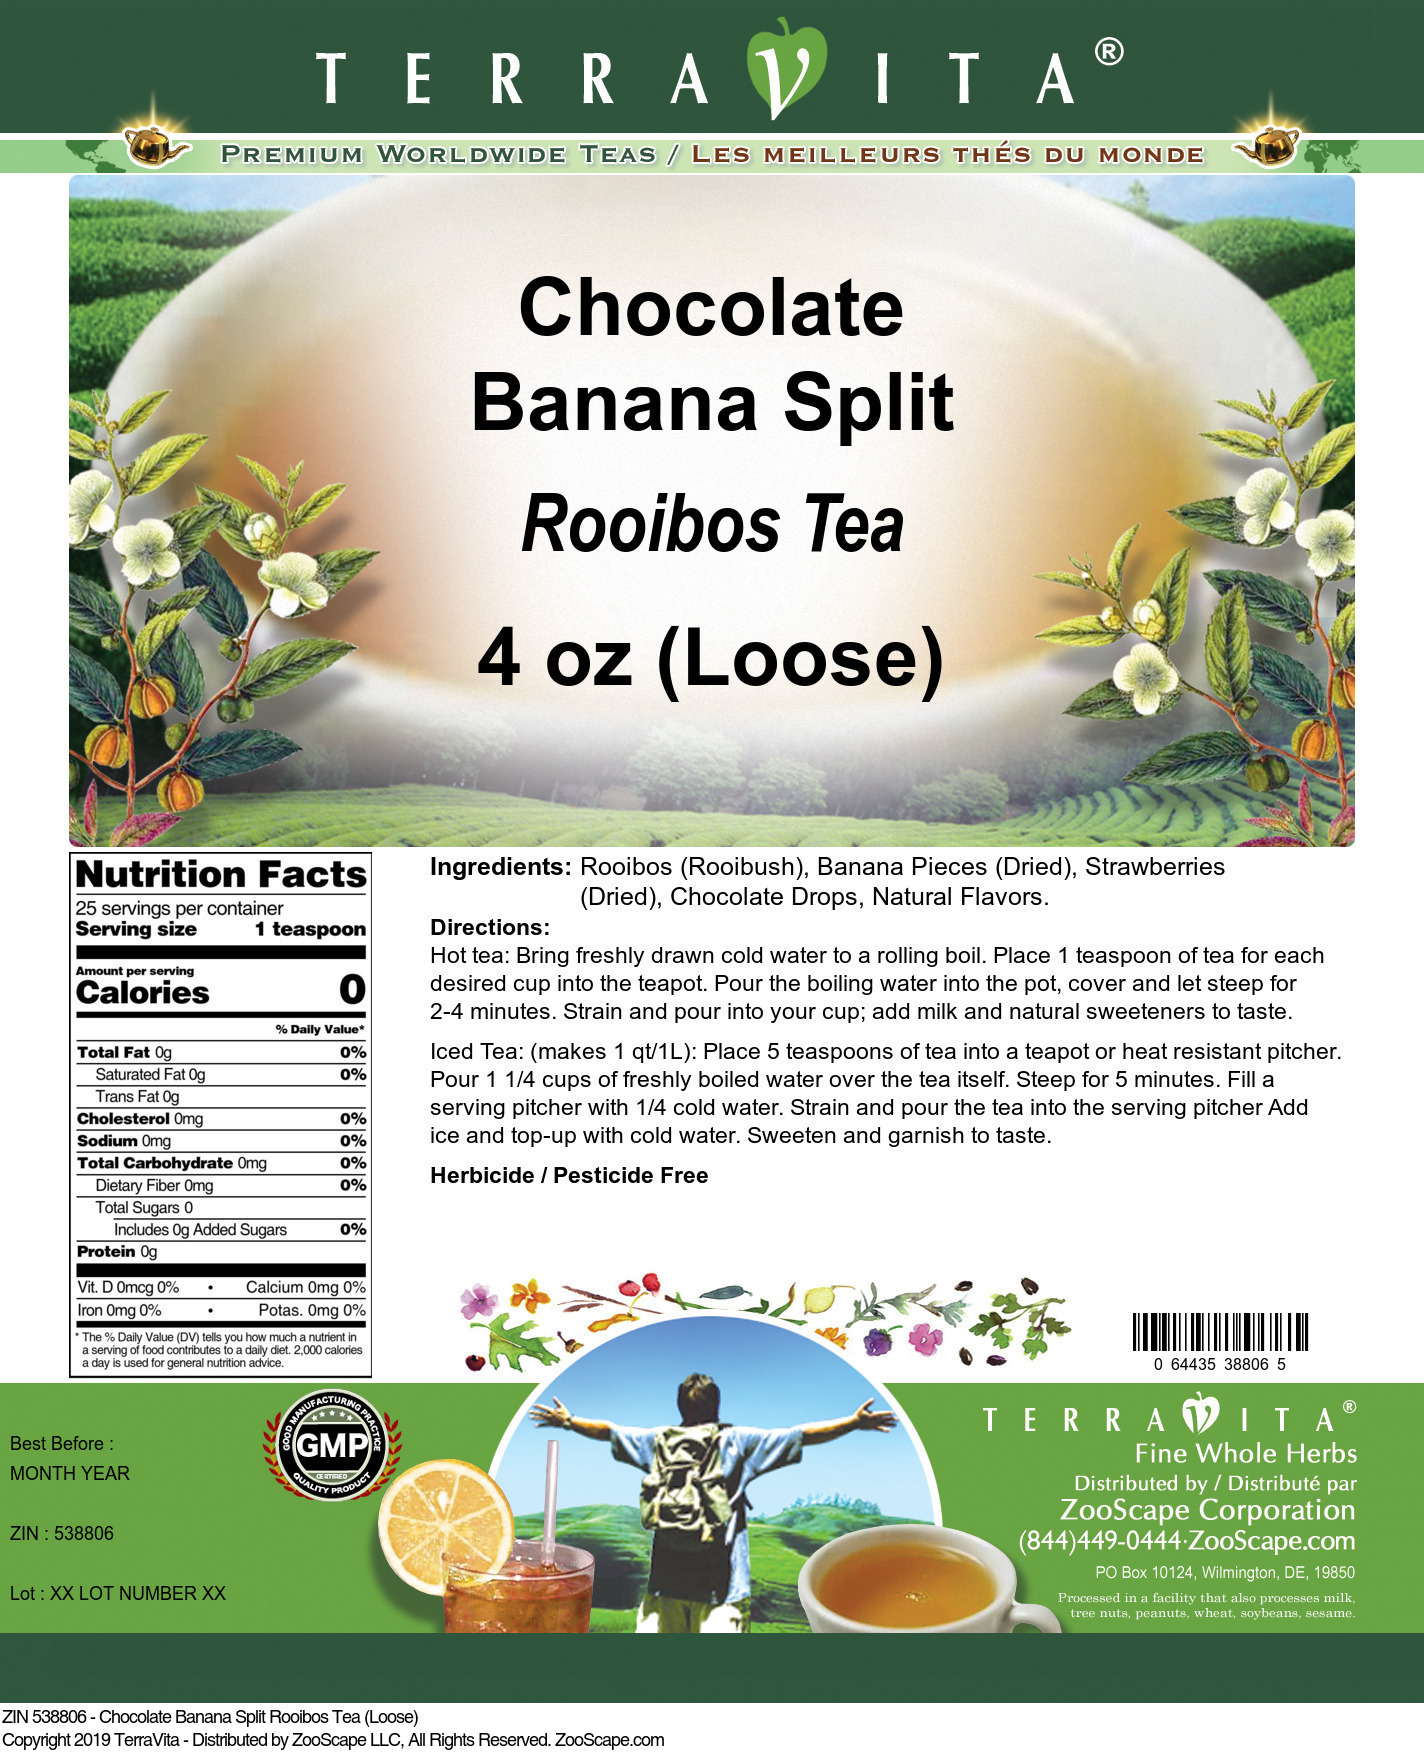 Chocolate Banana Split Rooibos Tea